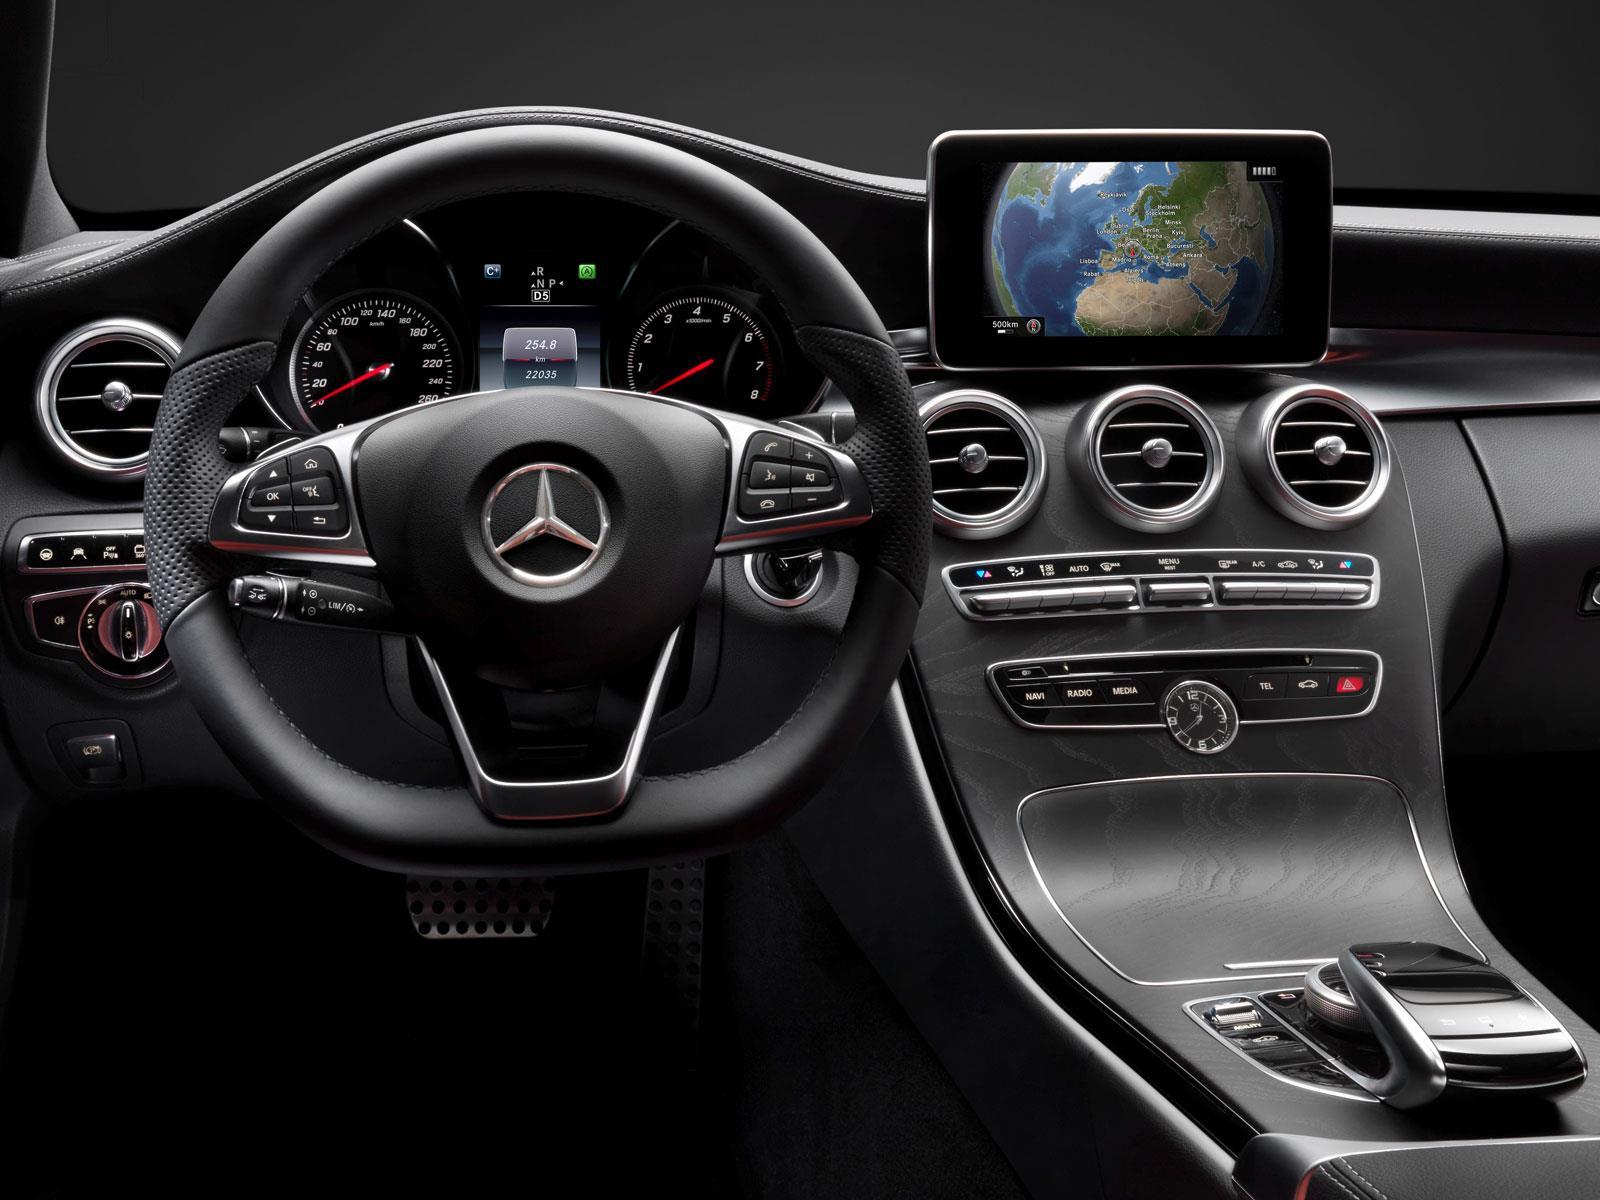 Mercedes benz clase c 2015 primeras im genes del interior for Interior mercedes clase c